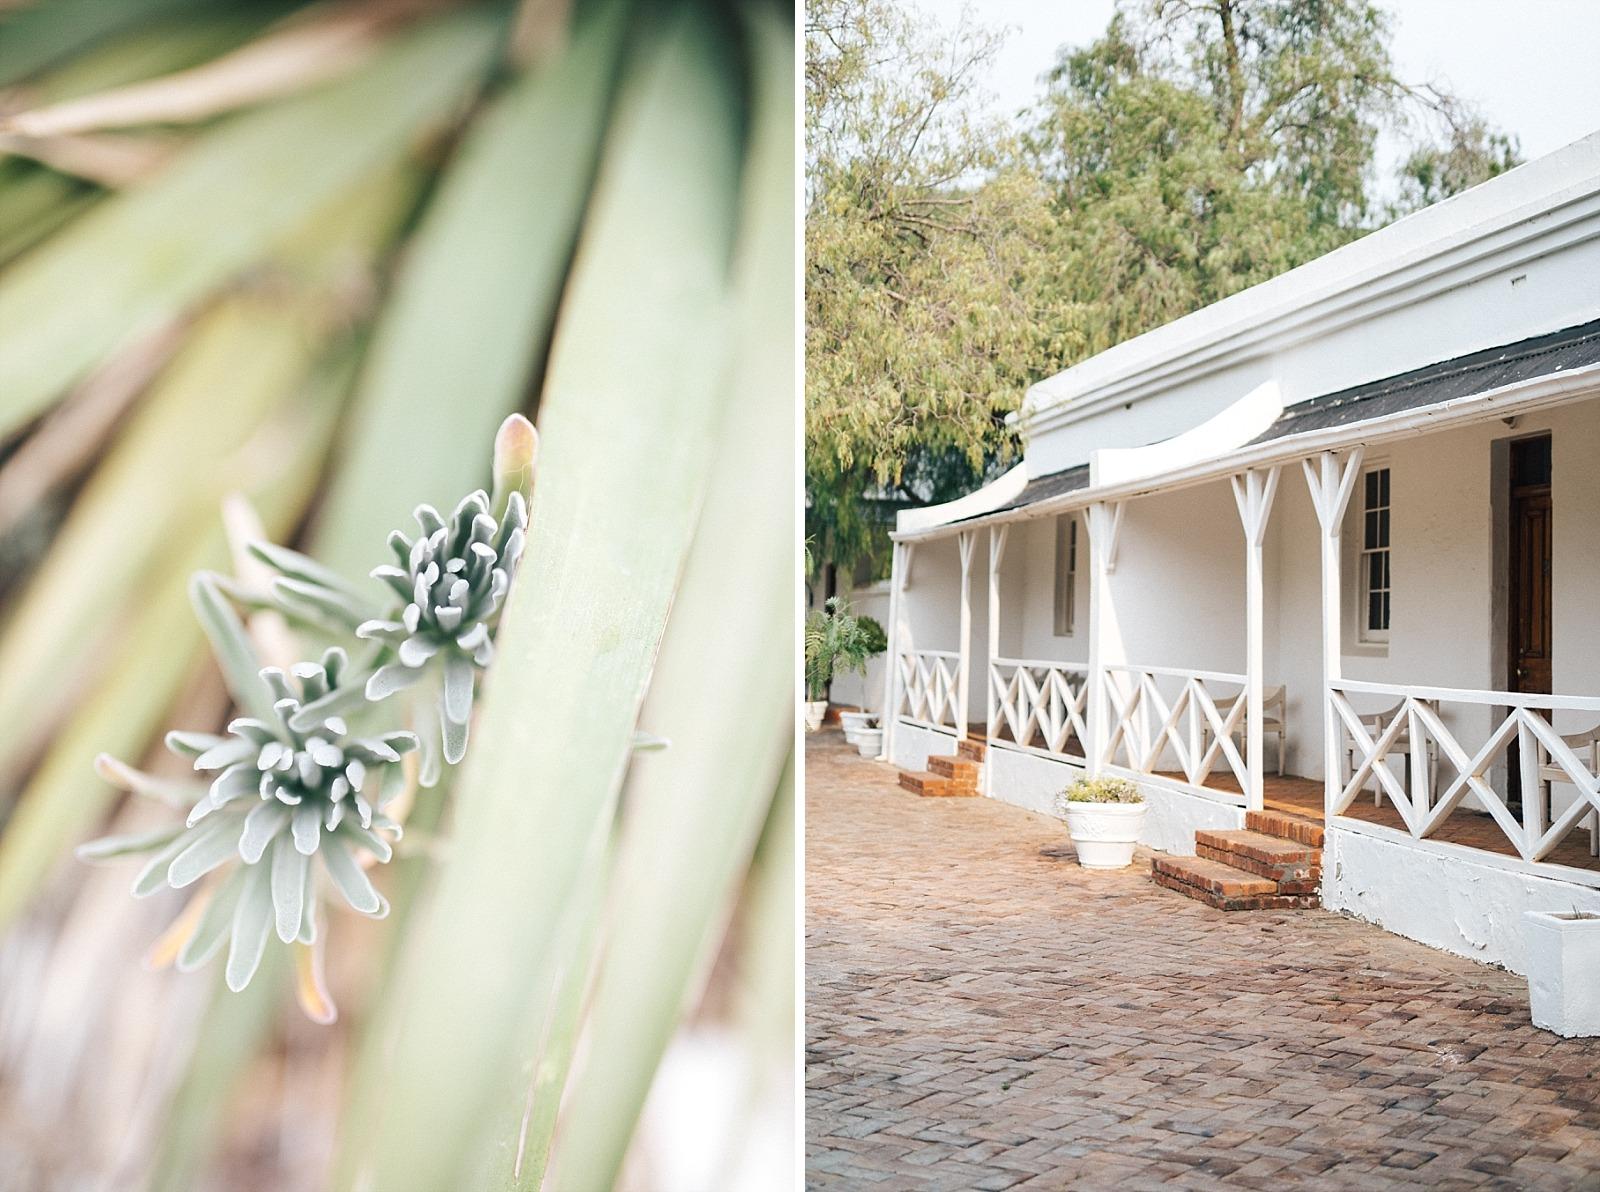 Maatjesfonteijn Karoo Afrique du sud Cape town  Lord Milner Hotel